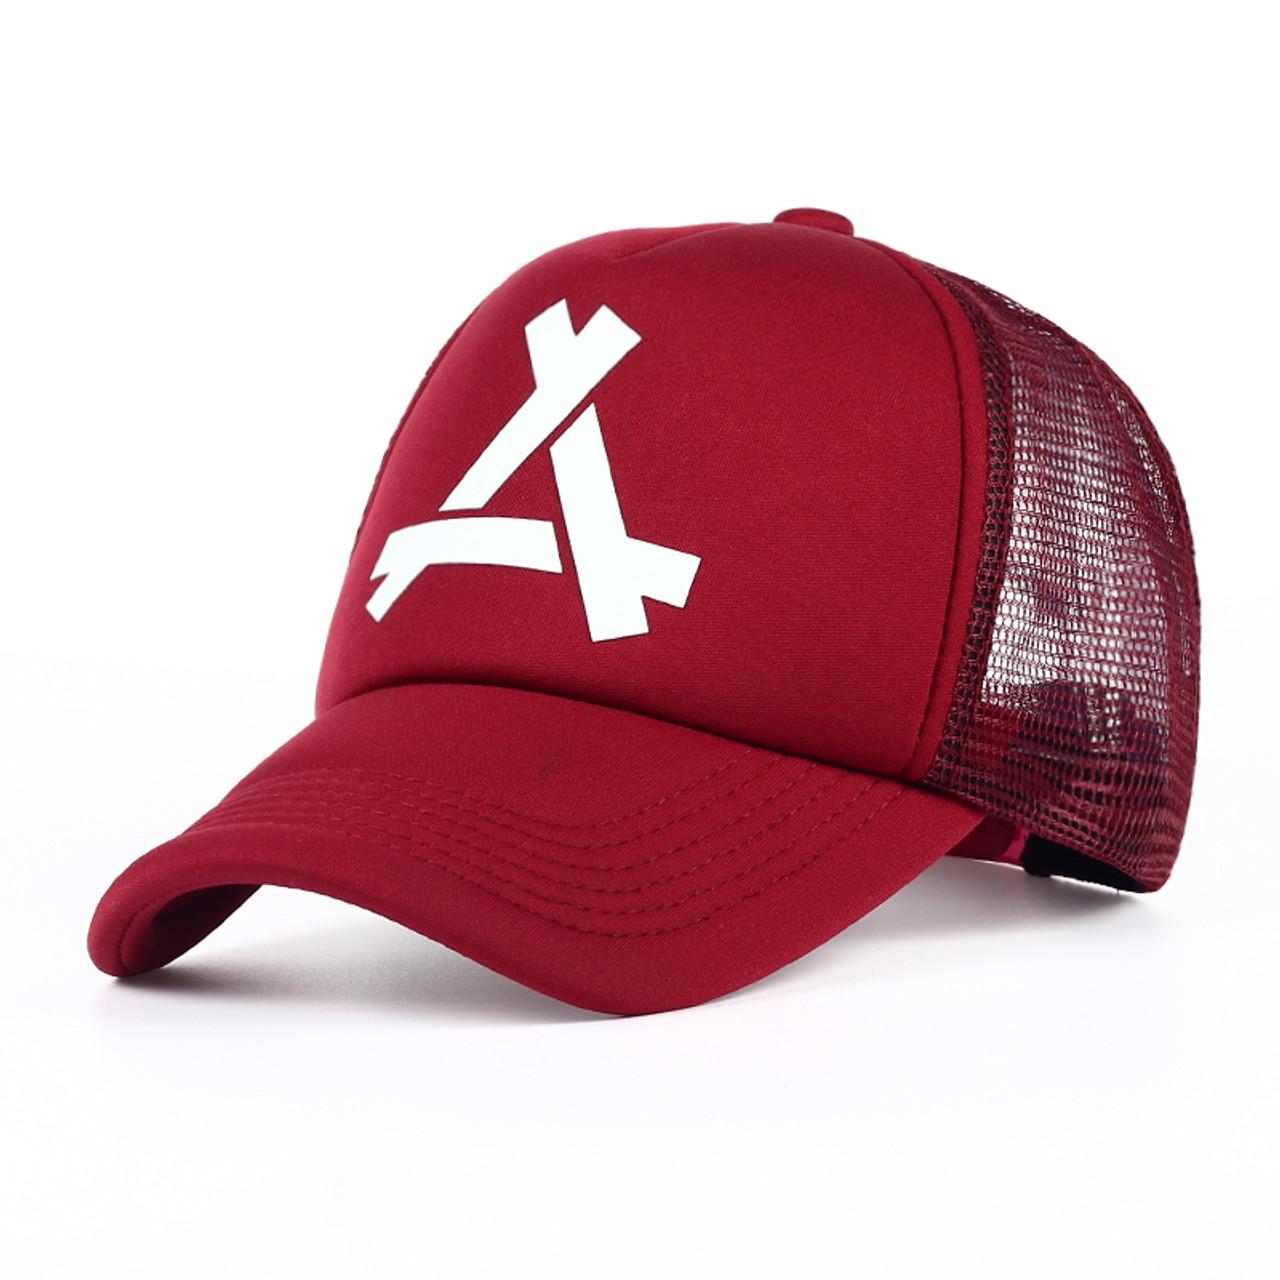 2a322537141 VORON 2017 New Summer Baseball Mesh Golf Cap Cap Snapback Hat Fashionable Polo  Sports Hiphop Trucker ...